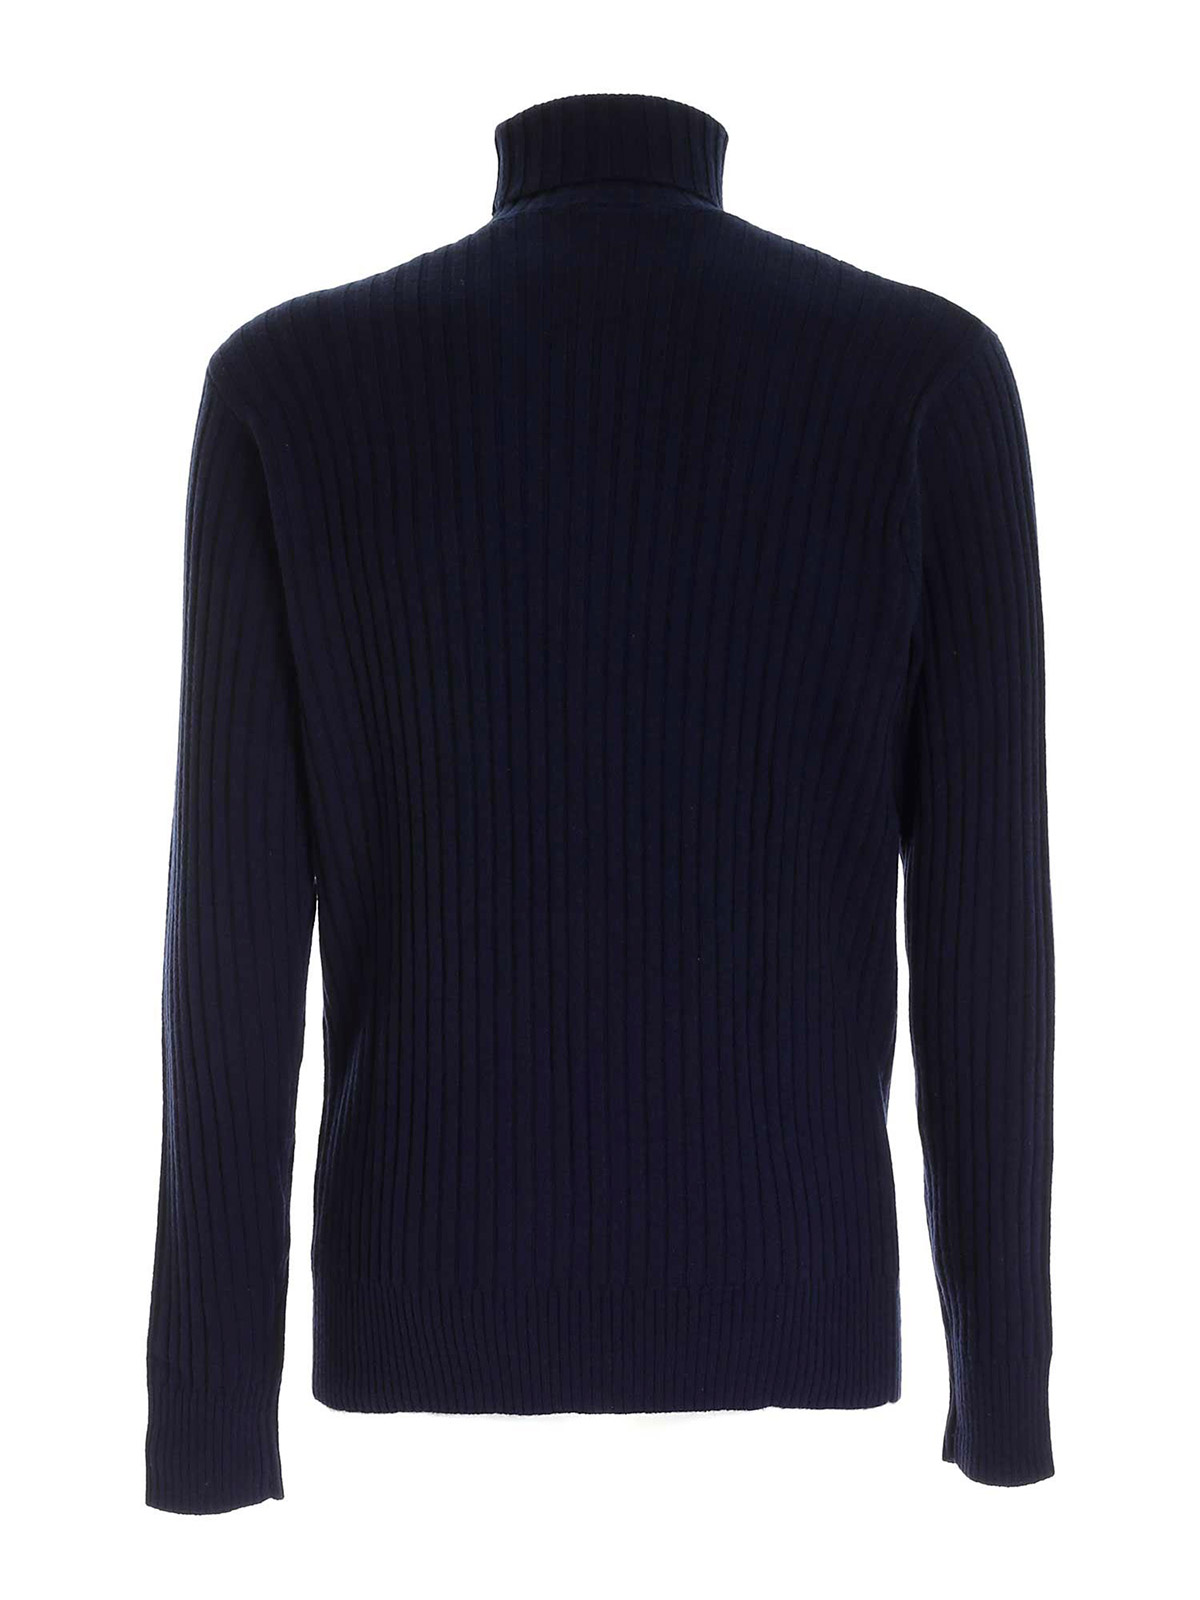 Picture of ASPESI | Men's Yak Turtleneck Sweater